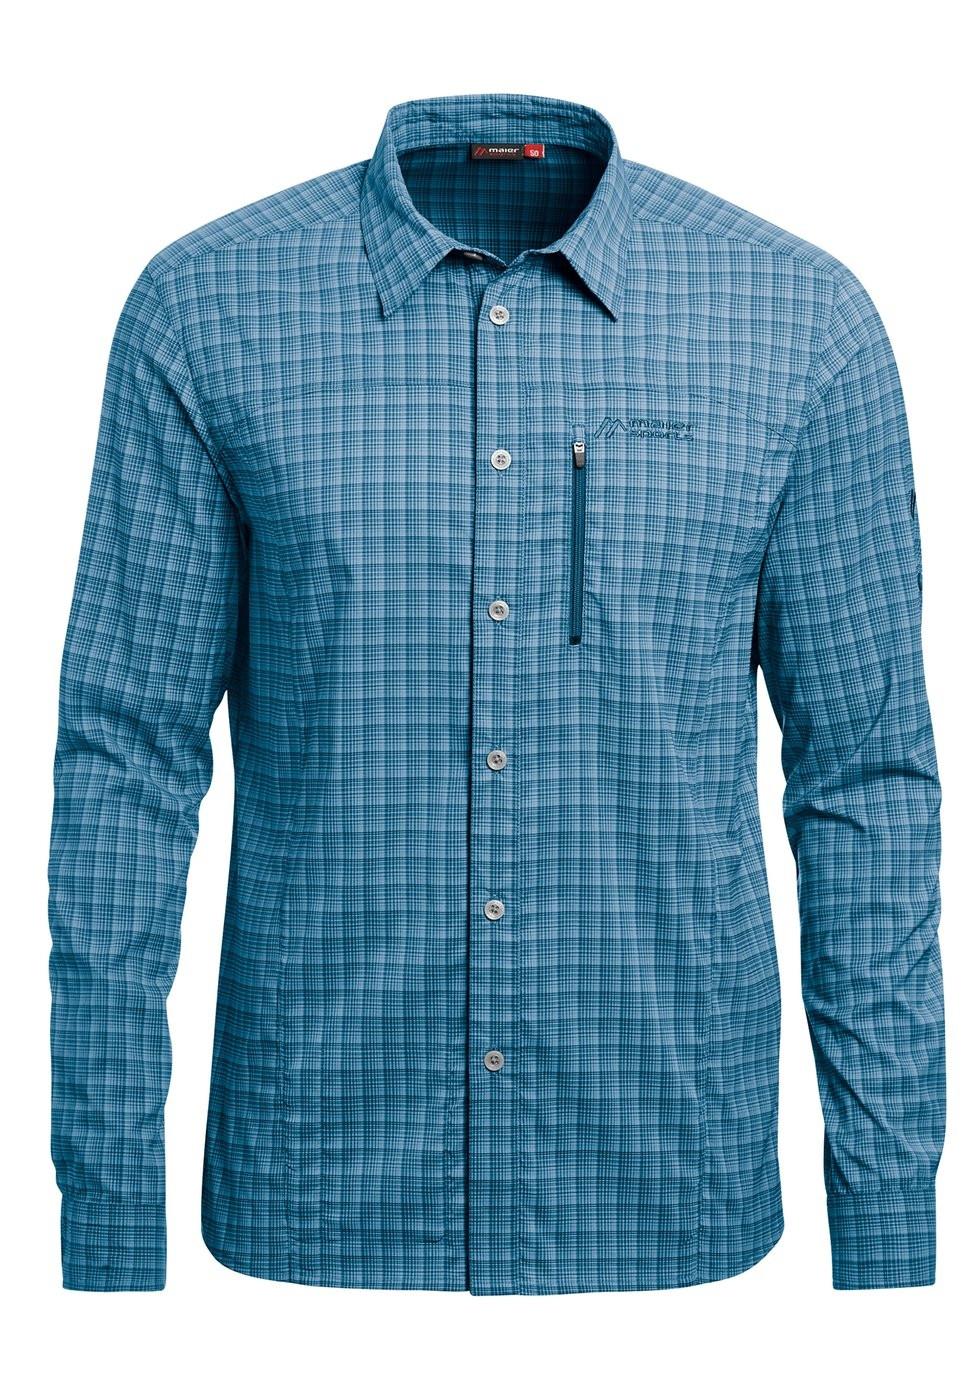 Koszula Madoc LS blue check